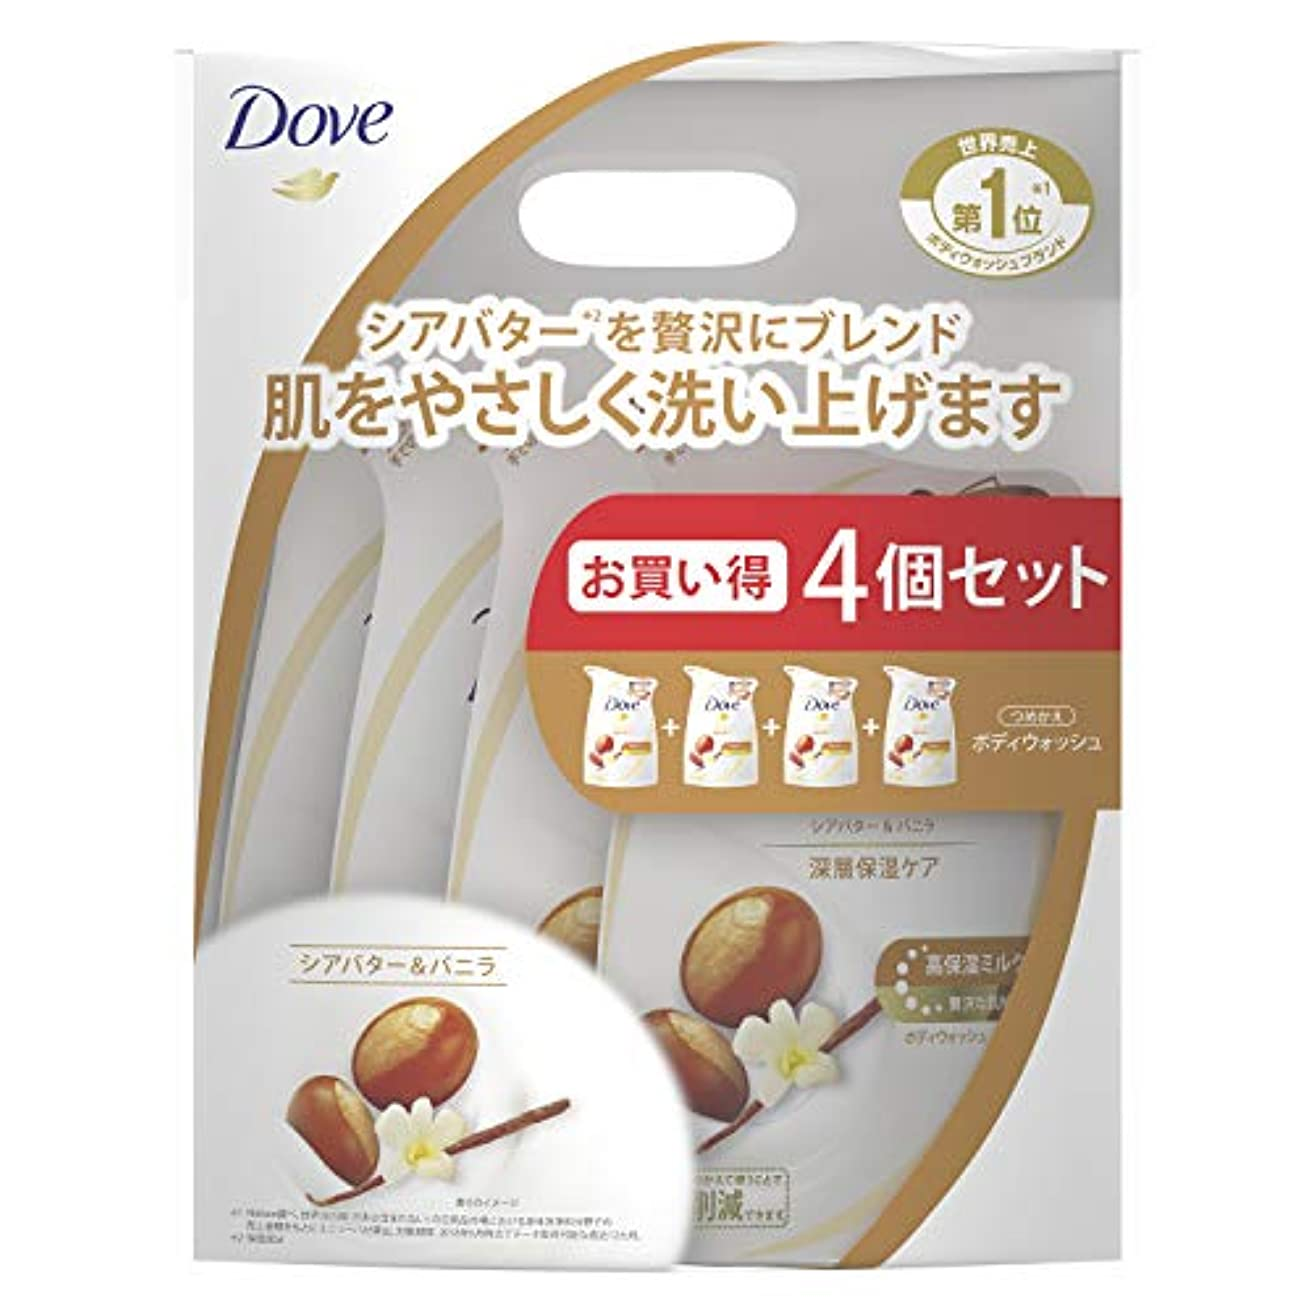 Dove(ダヴ) ダヴ ボディウォッシュ リッチケア シアバター&バニラ つめかえ用 4個セット ボディソープ 詰替え 340g×4個